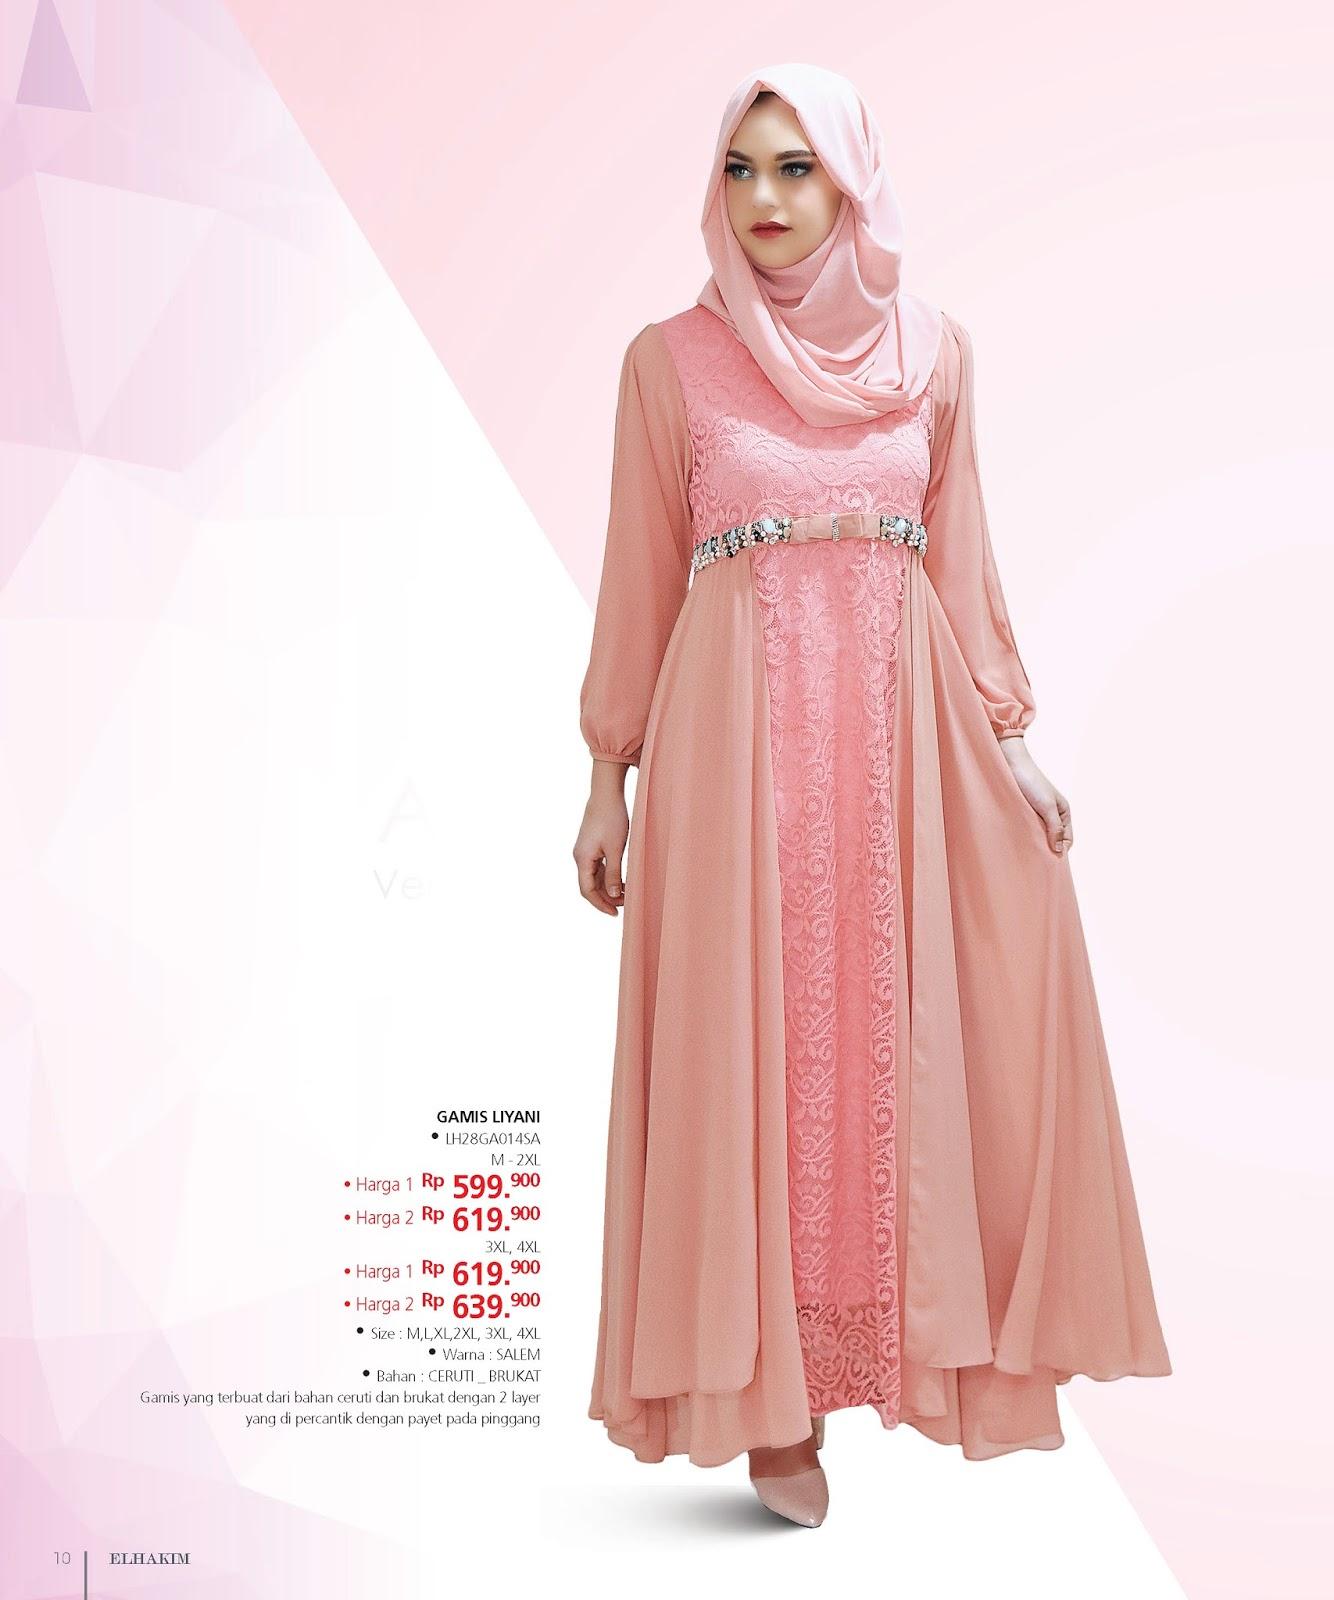 Baju Muslim Ibu Ibu Murah Busana Baju Muslim Wanita 0813